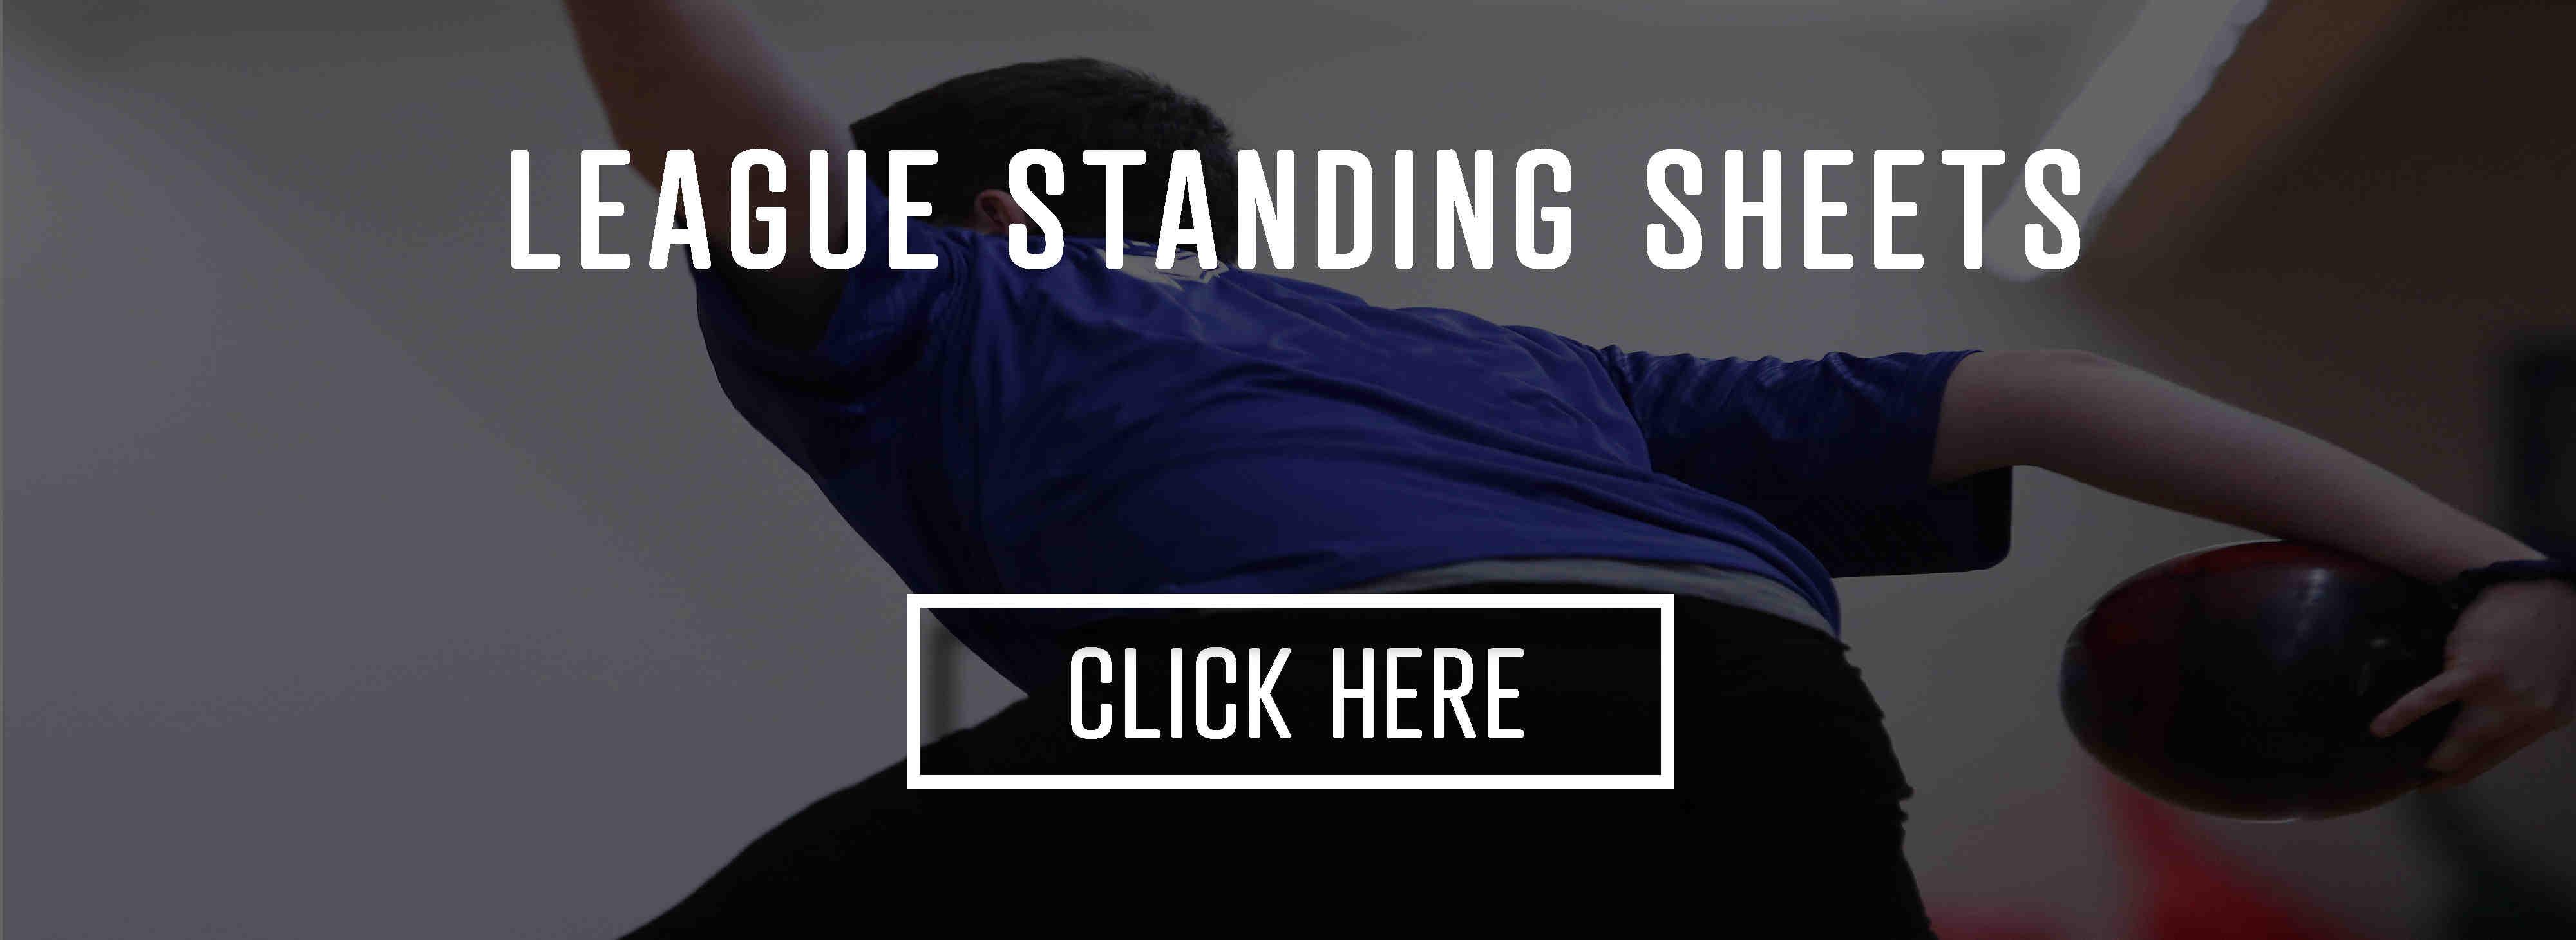 League standing sheets